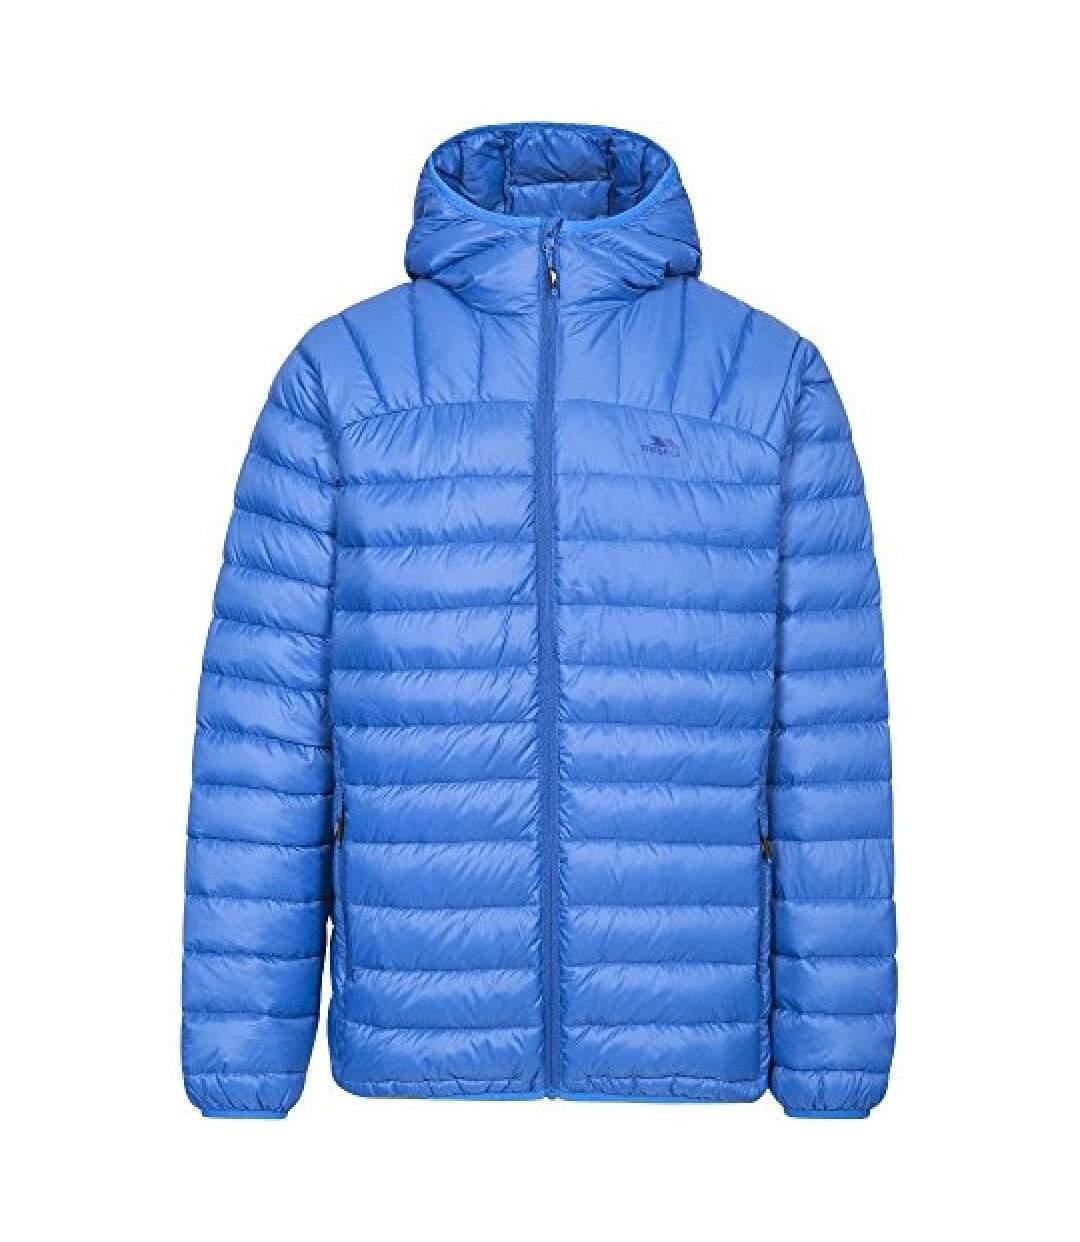 Trespass Mens Romano Down Jacket (Blue) - UTTP3776